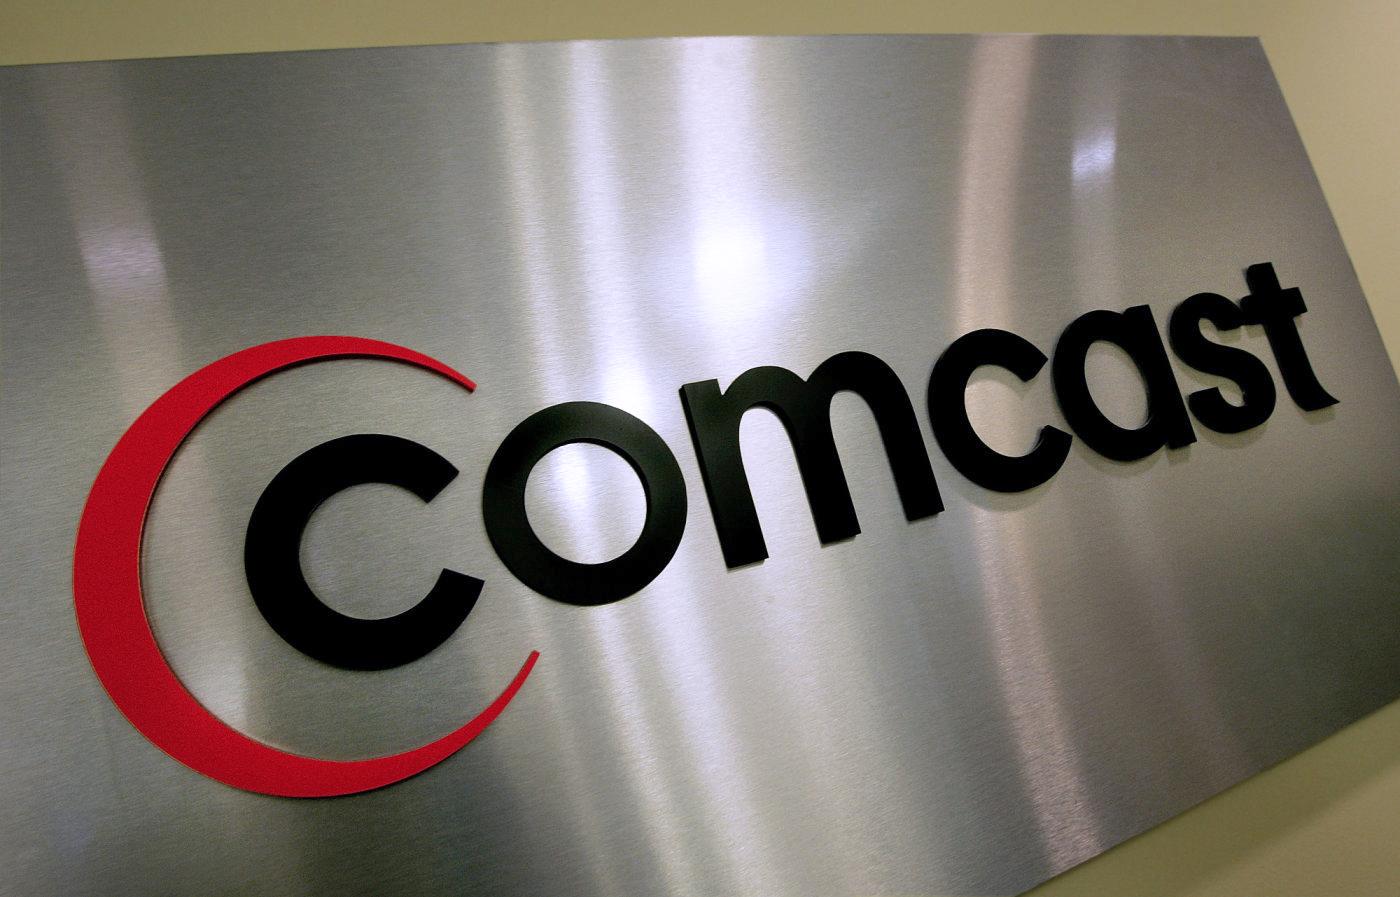 comcast cable customer service - Monza berglauf-verband com